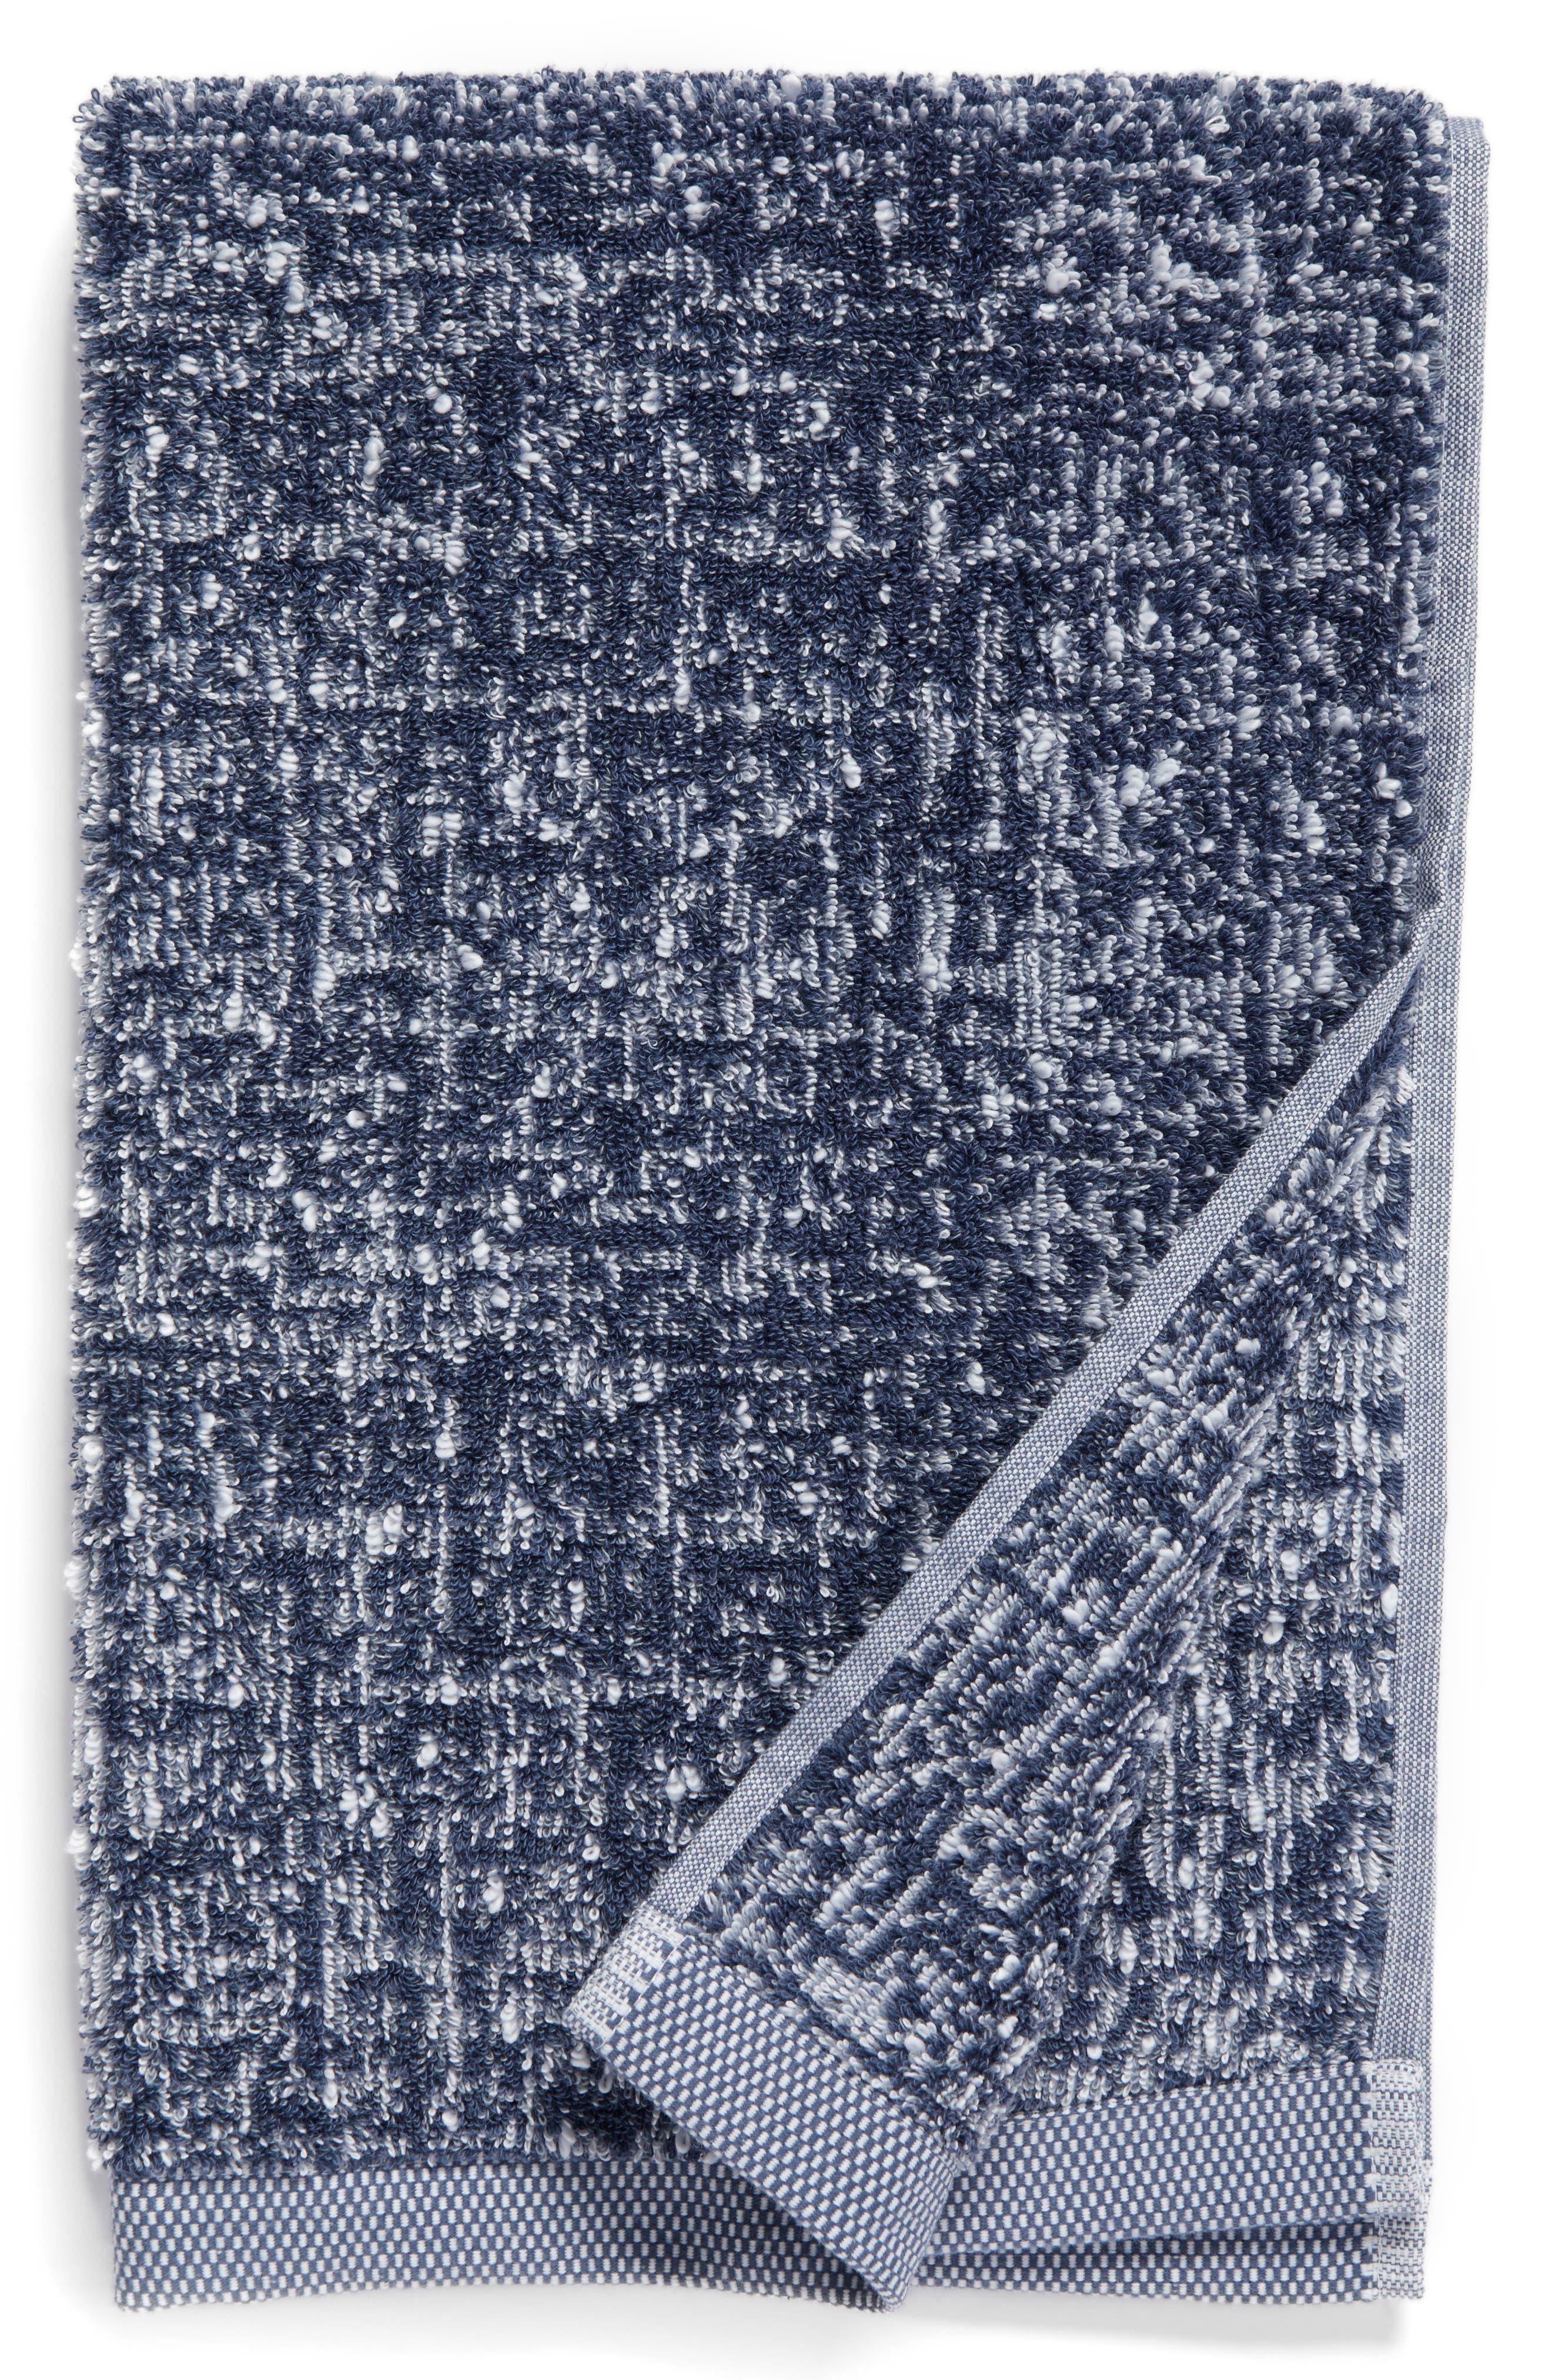 Alternate Image 1 Selected - Nordstrom at Home Tweed Jacquard Hand Towel